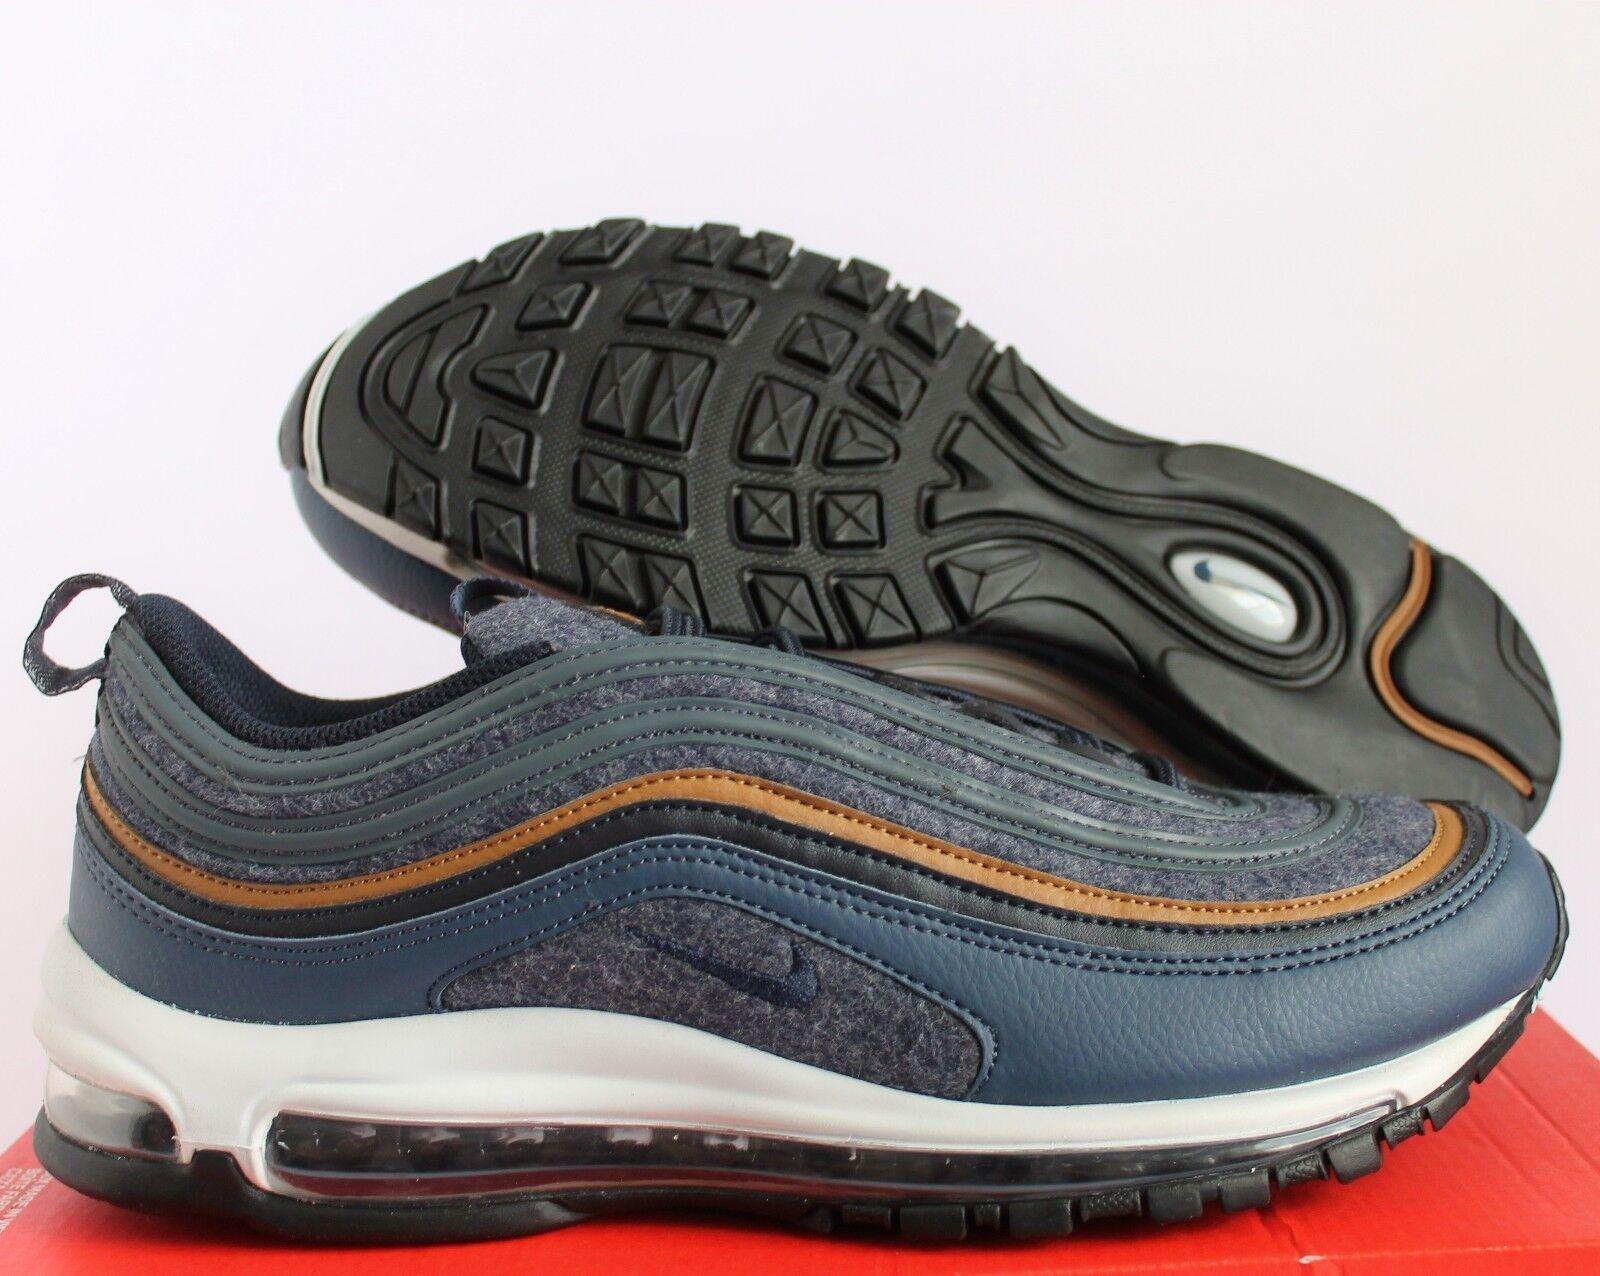 Nike air max 97 uomini premio thunder blue-dark ossidiana sz - 312834-400]